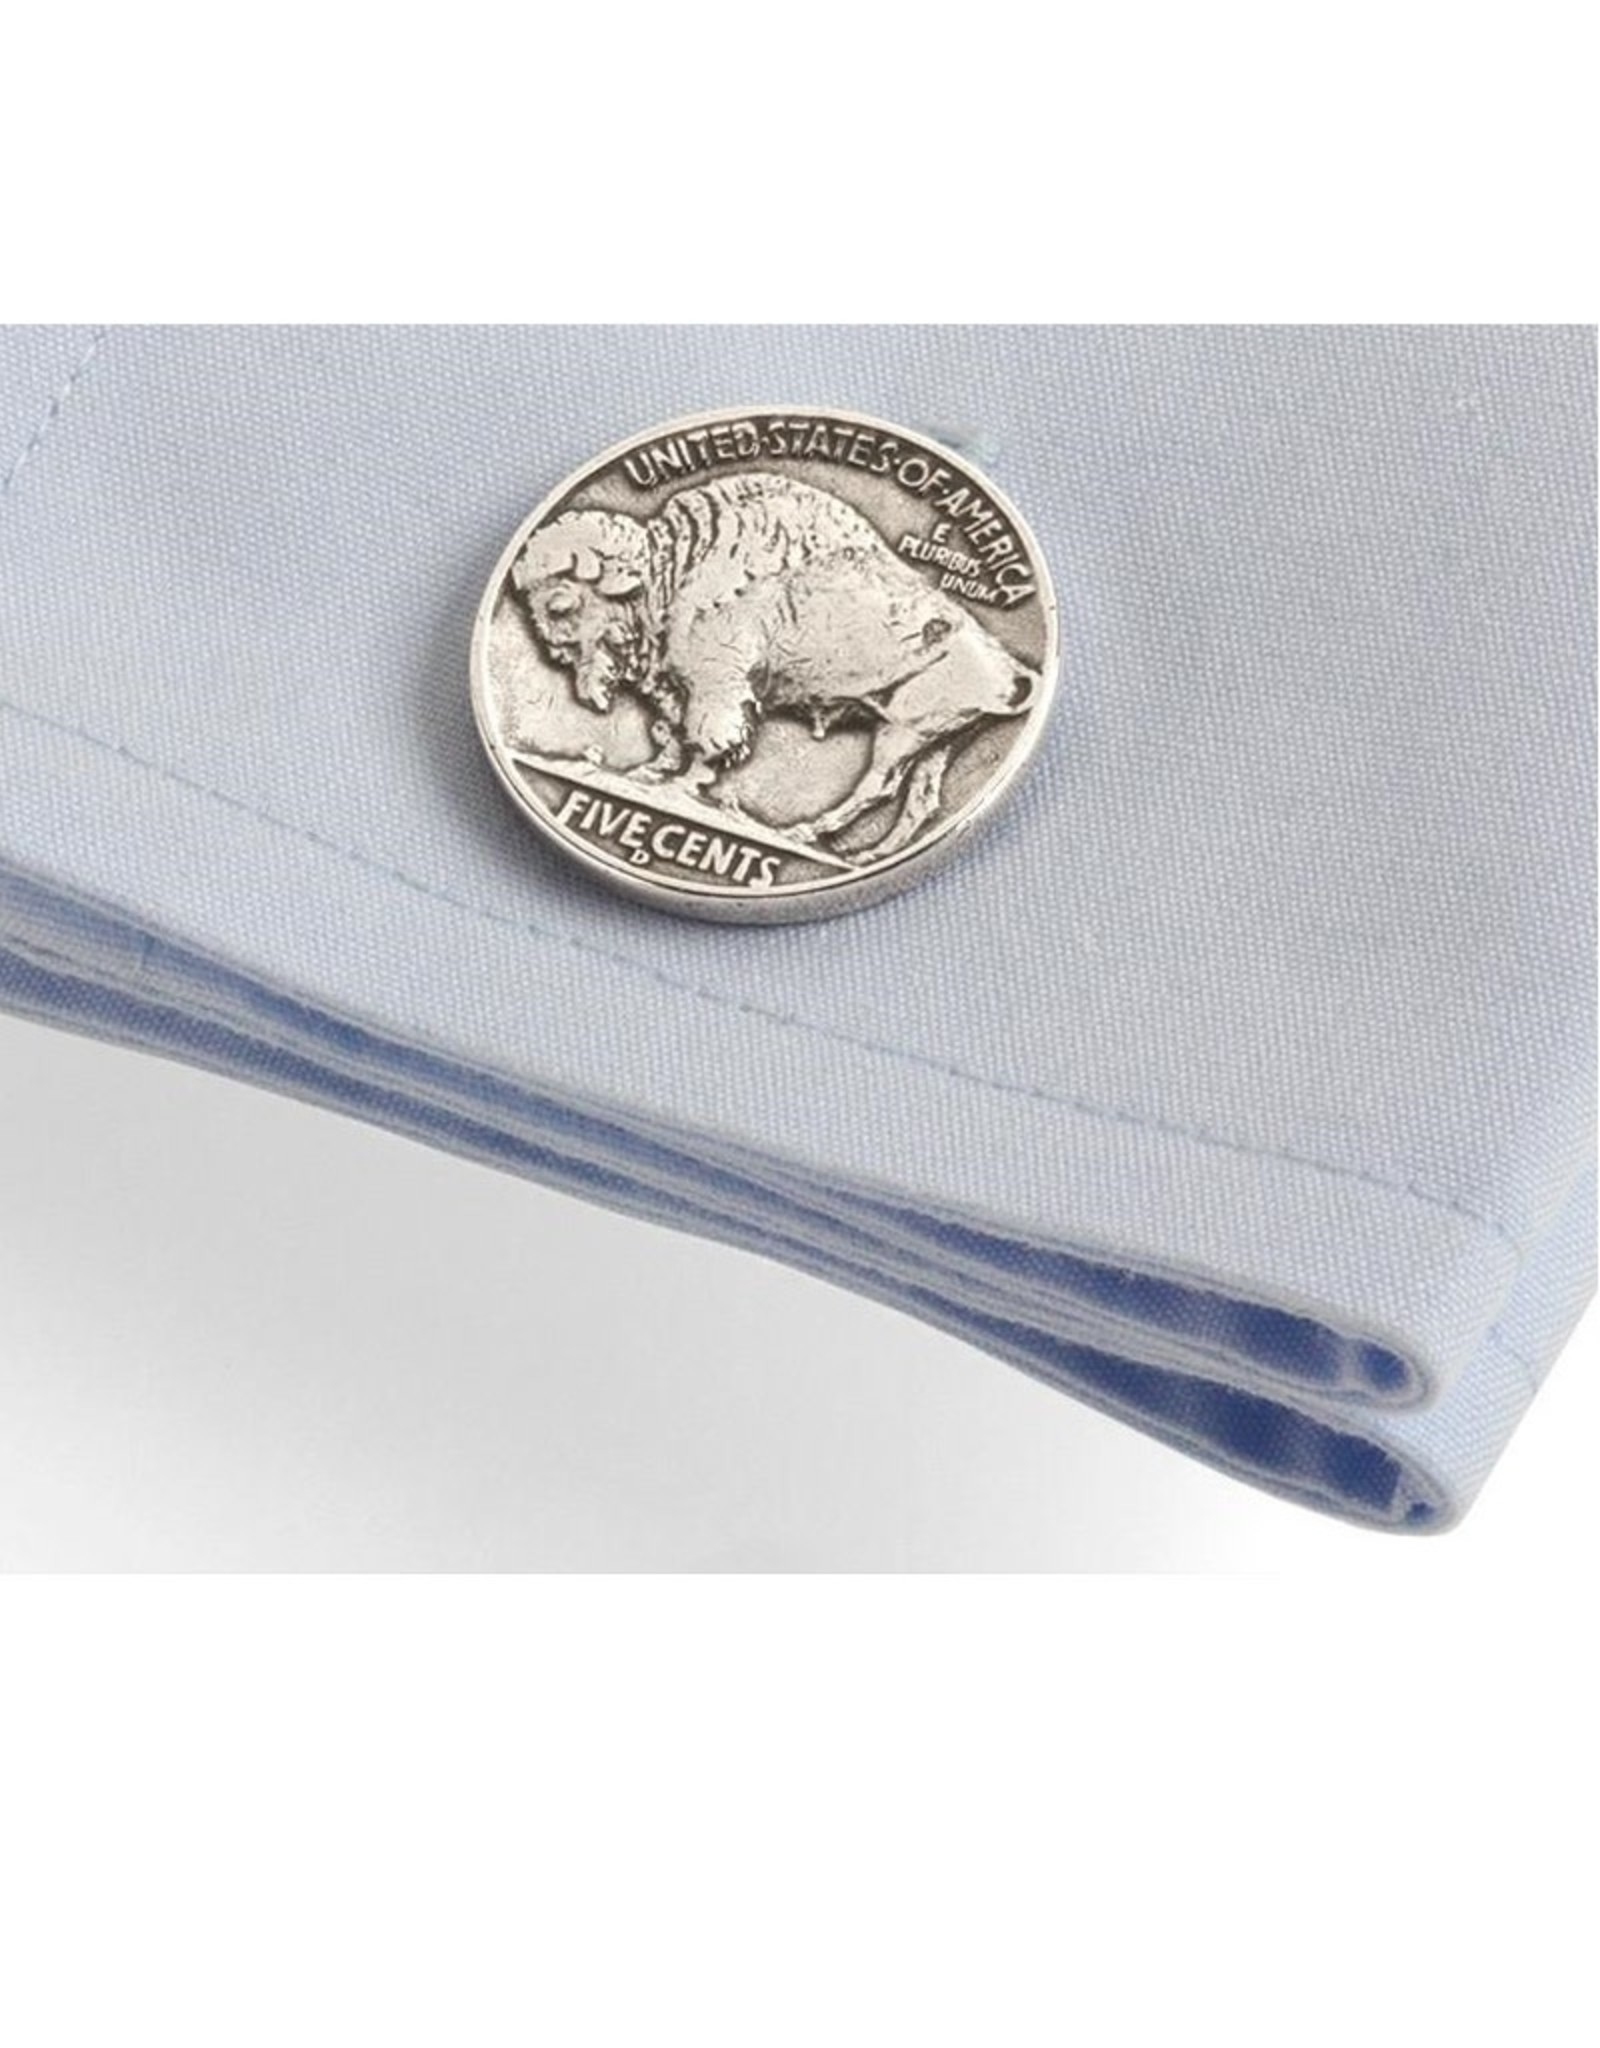 Tokens & Icons Buffalo Nickel Cuff Links